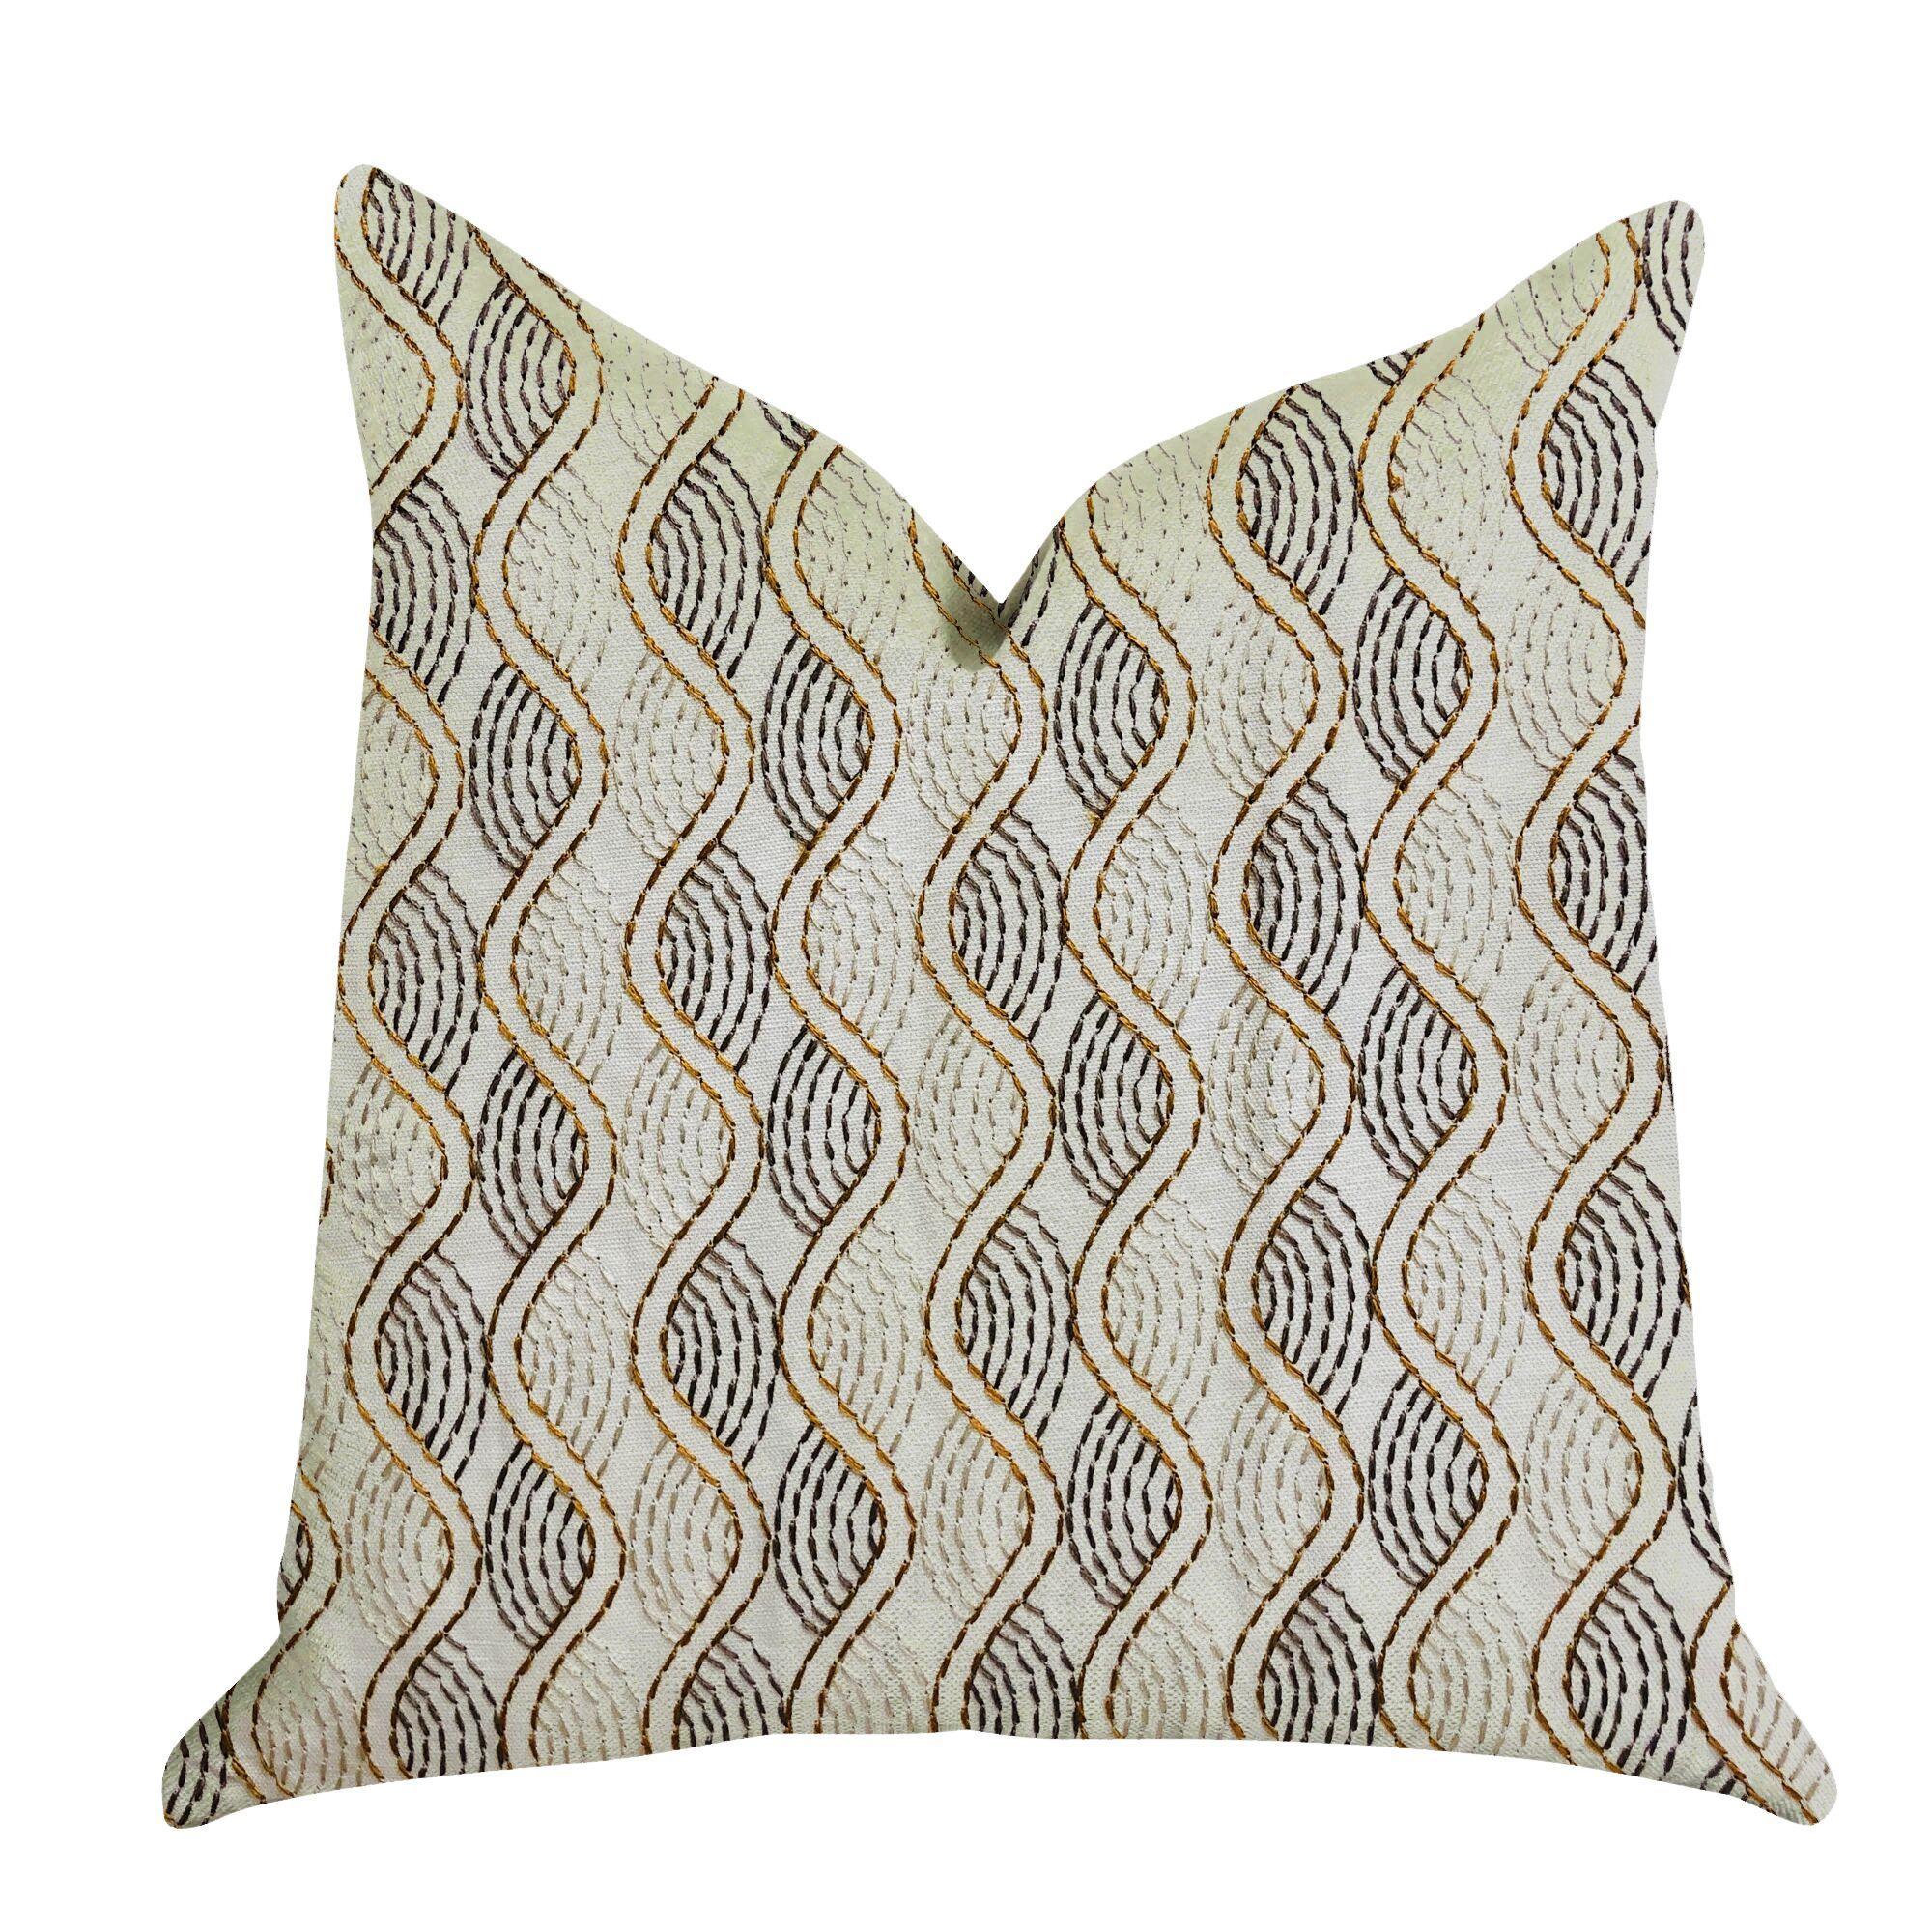 Mccrory Luxury Pillow Size: 16